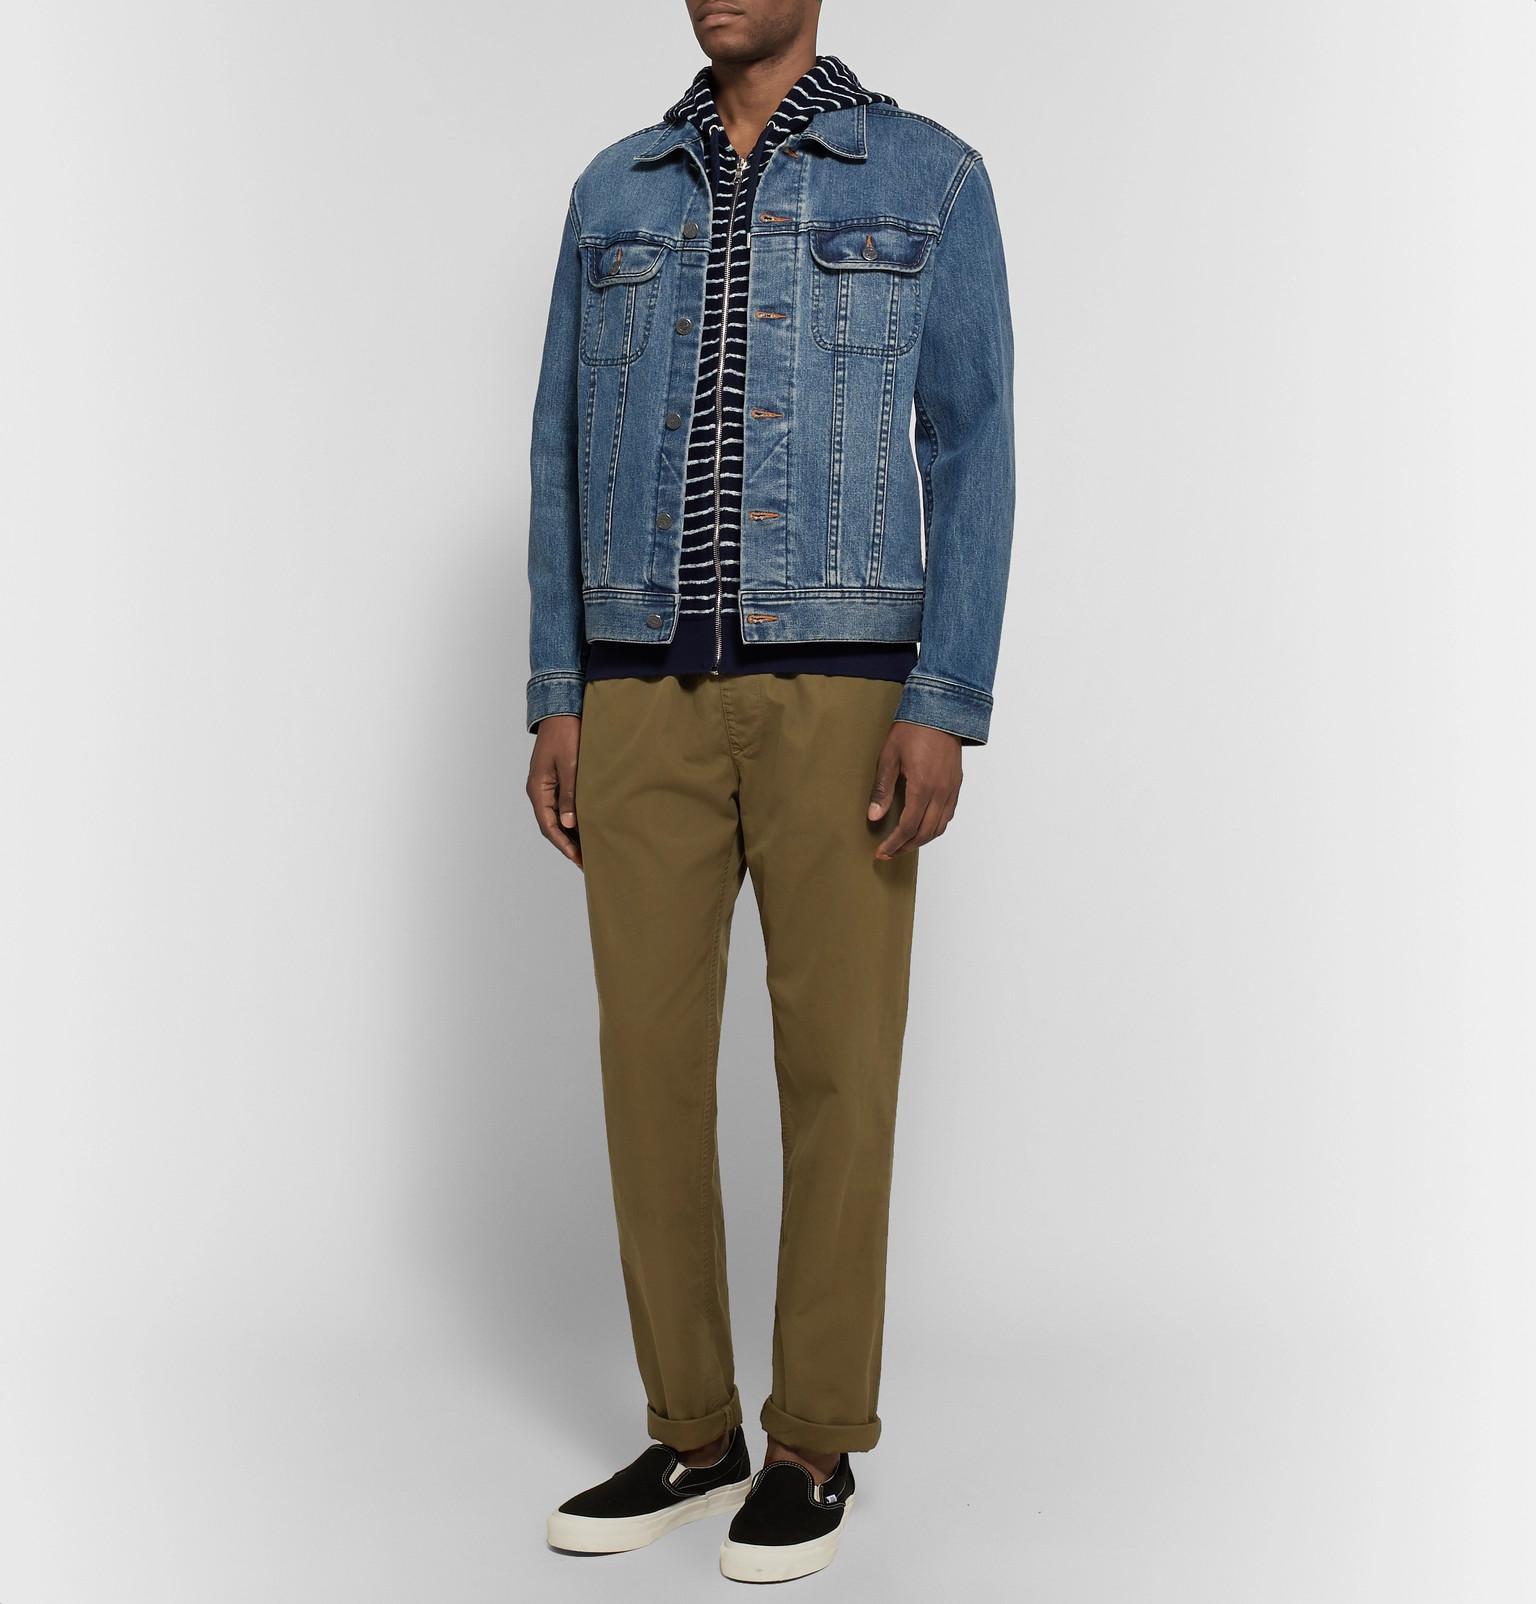 Zip Terry Orlebar Hoodie Up Thurloe For Cotton Striped Blue Fullscreen View Men Brown xqaHqgA